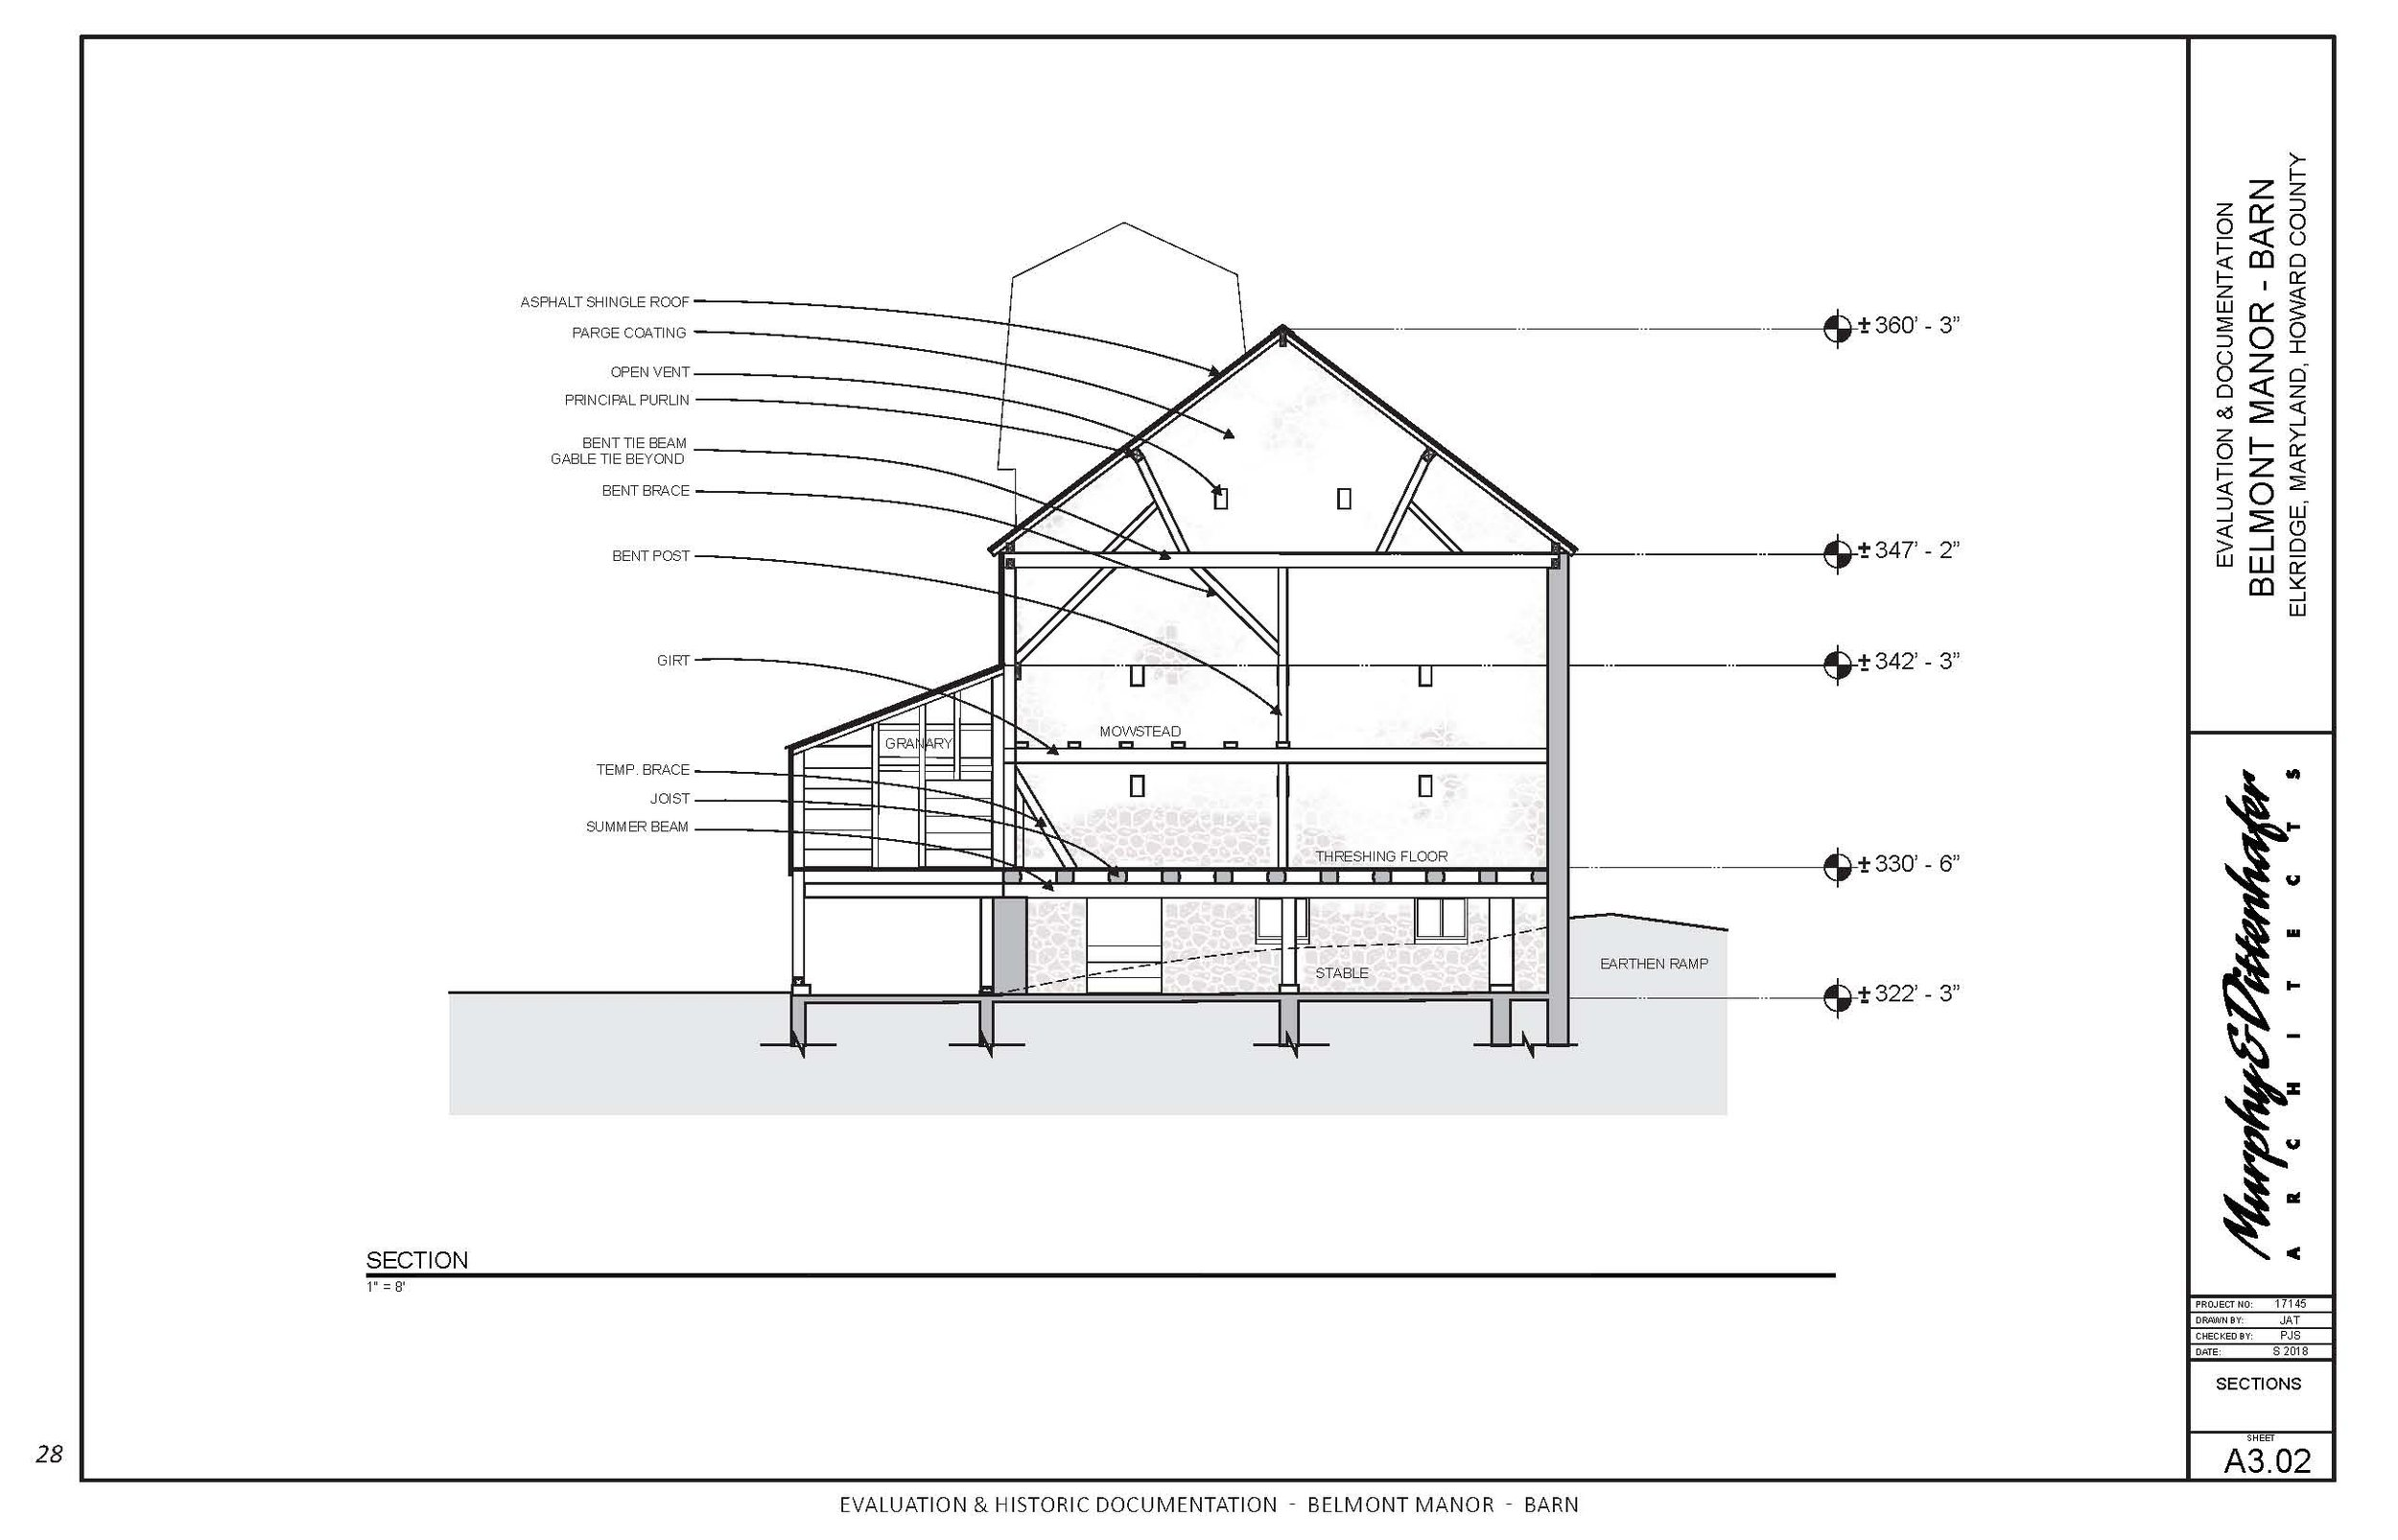 042418_17145 - Belmont Barn Study - Report - Final Draft_Page_32.jpg